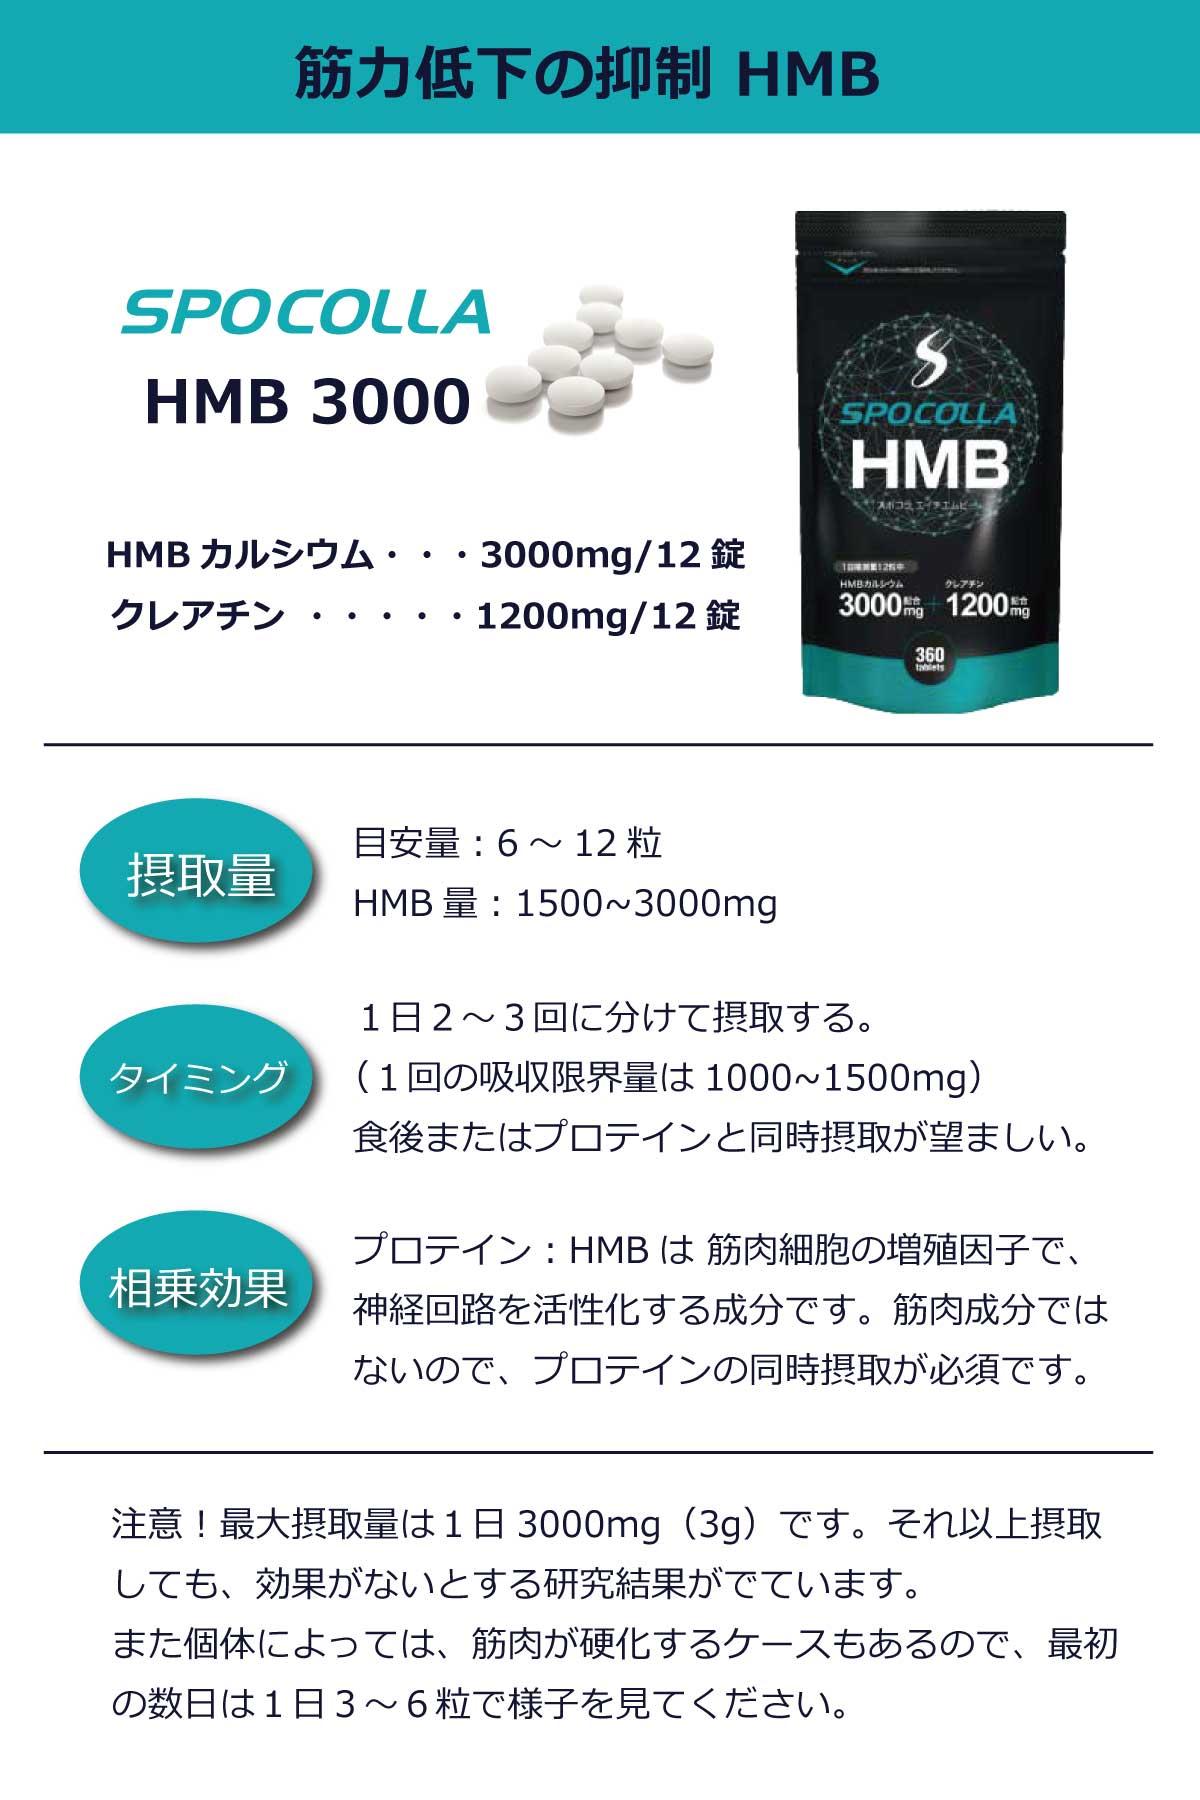 HMBの効果的な食べ方